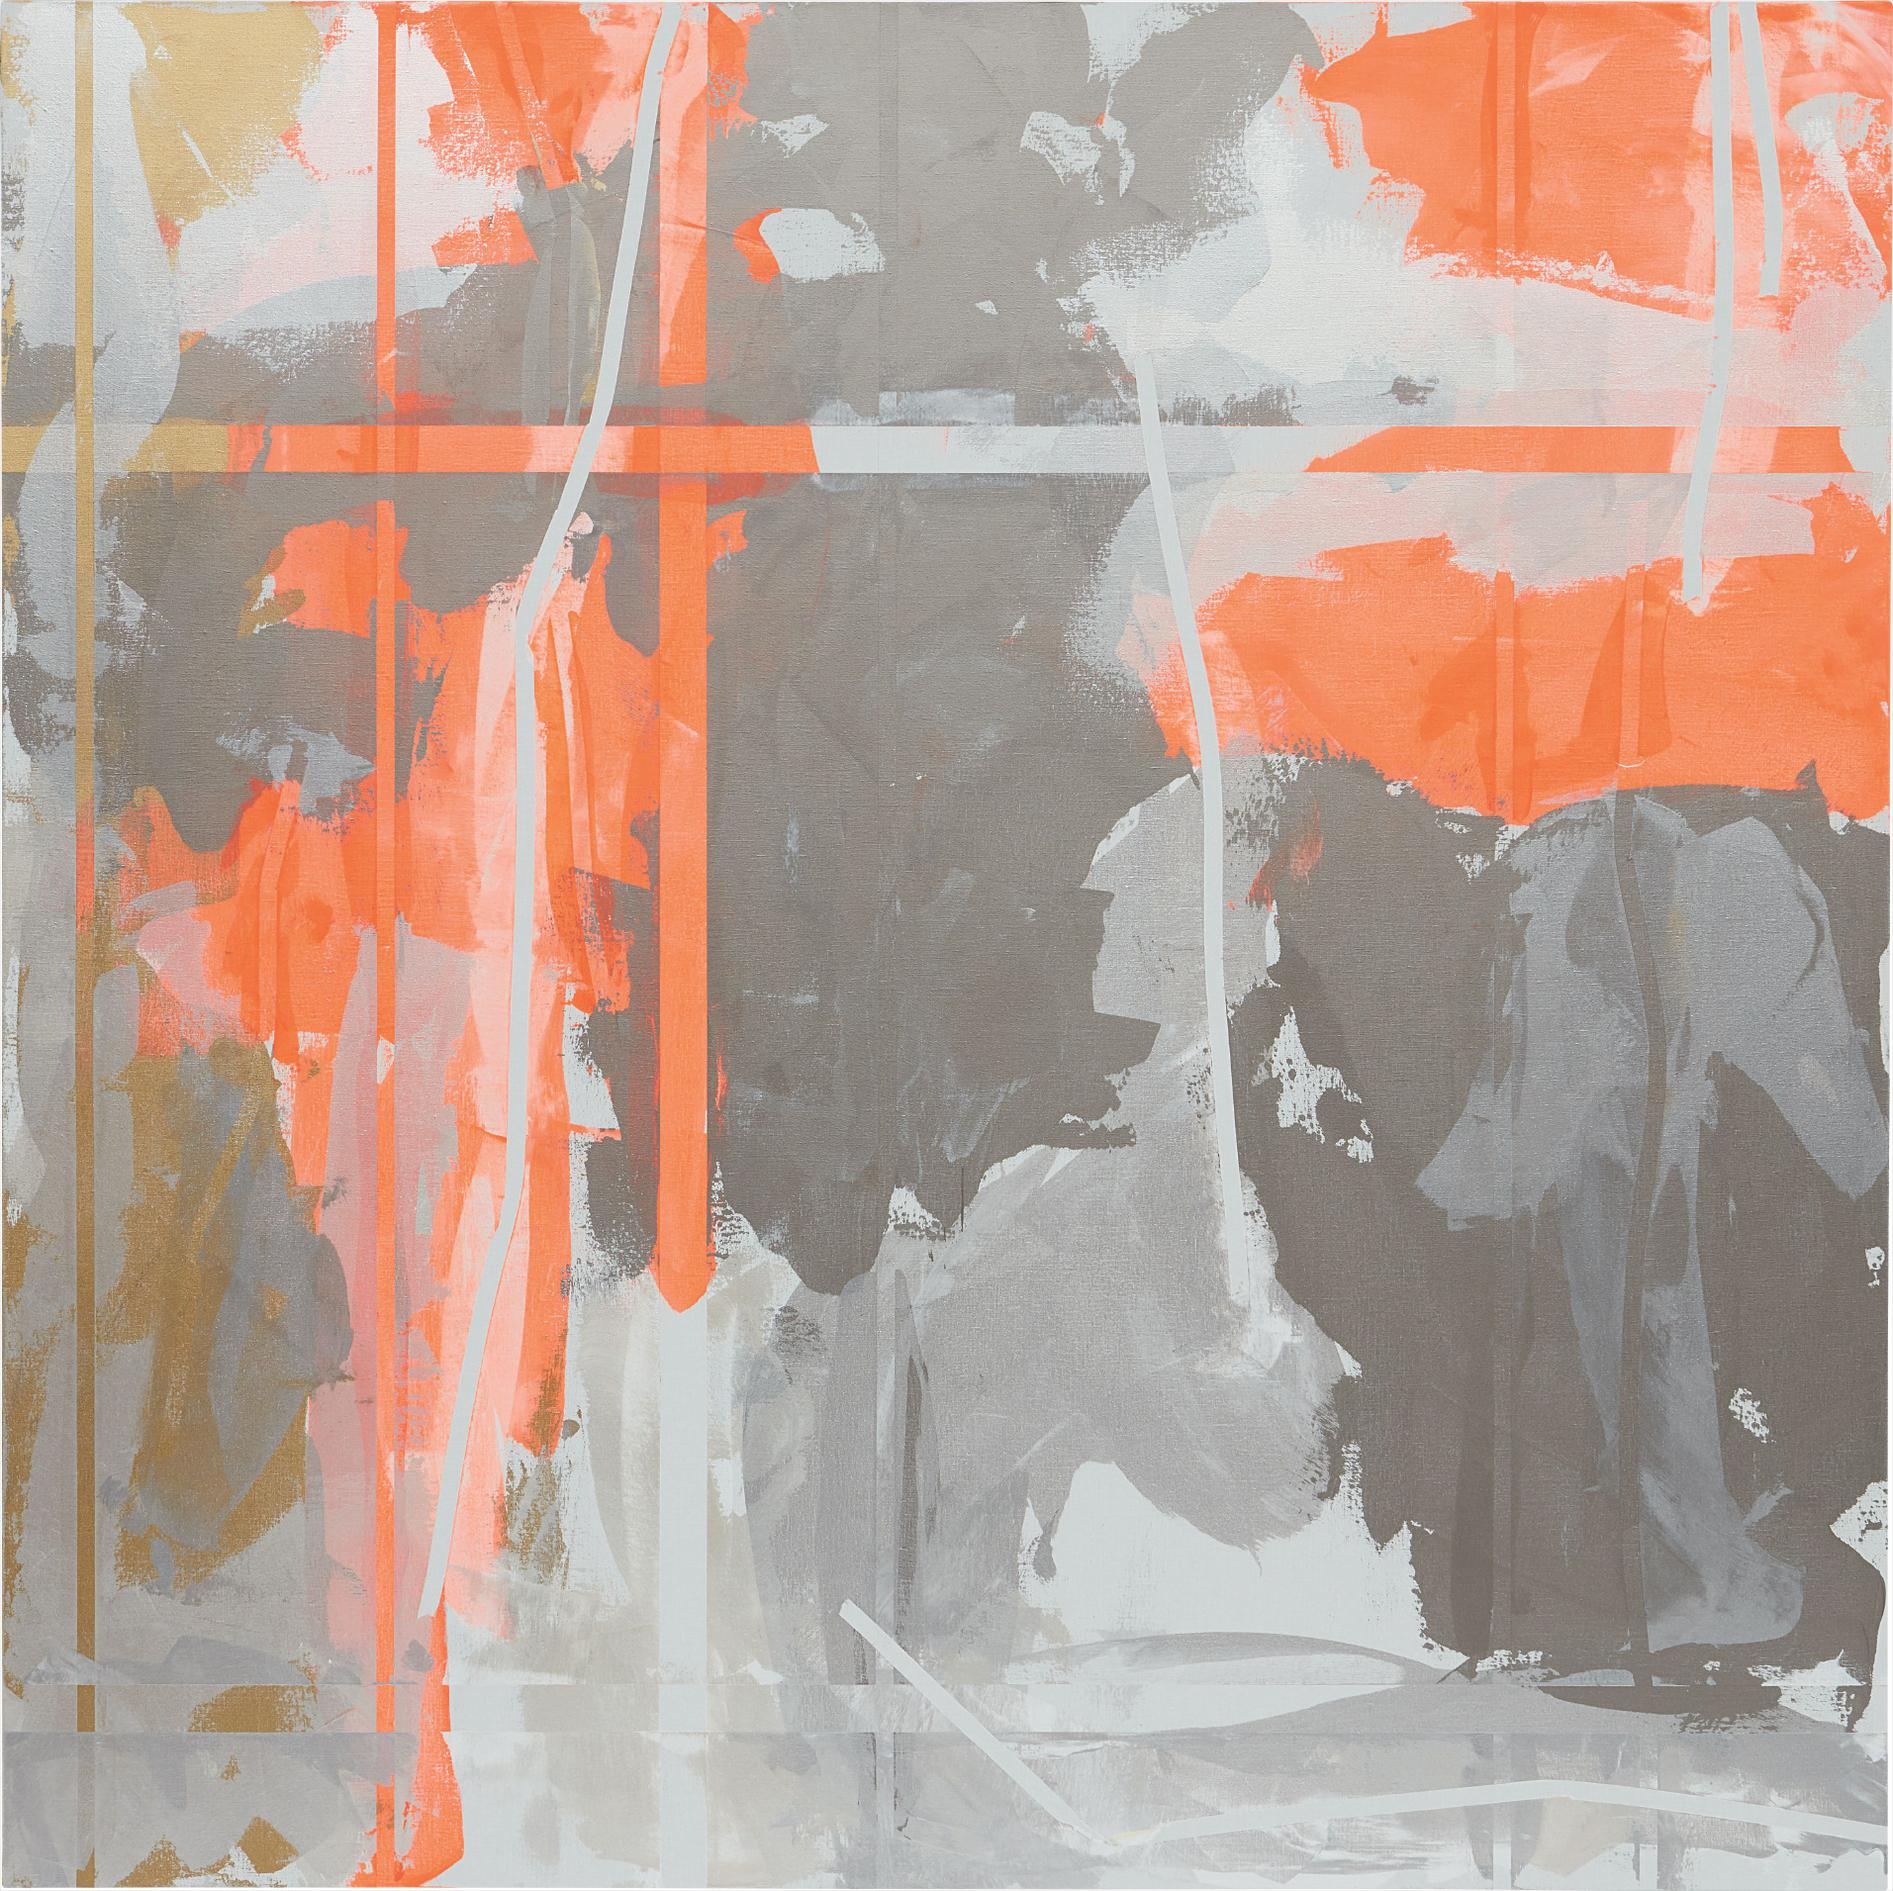 Heimo Zobernig-Untitled-2013